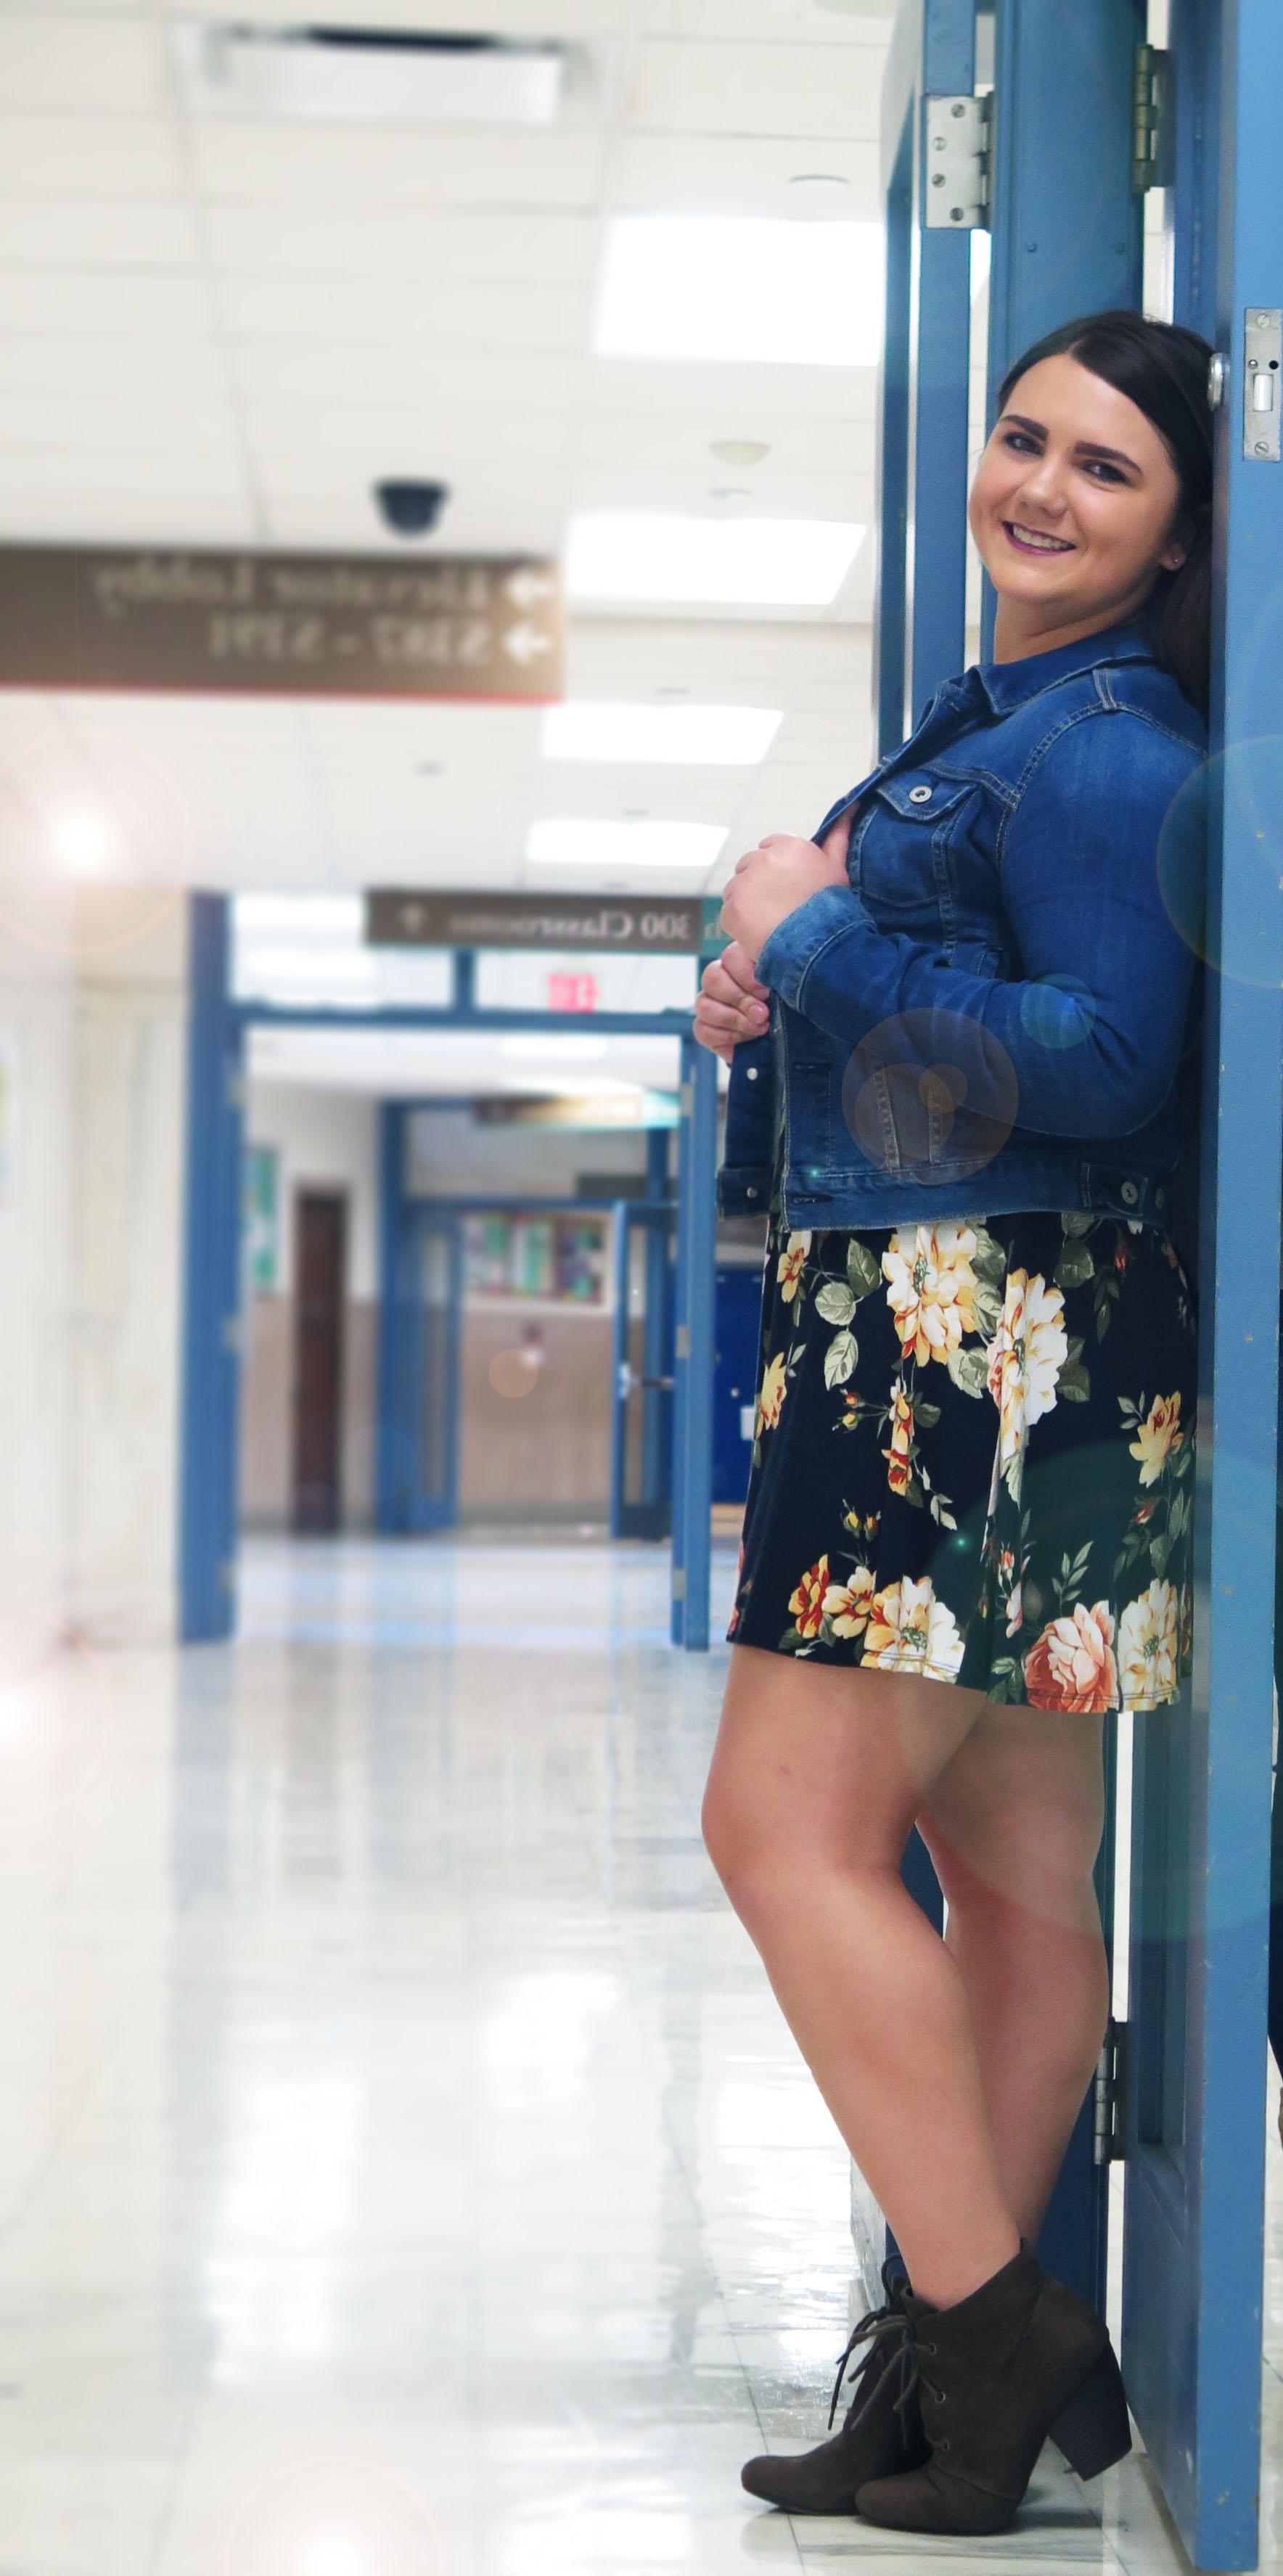 ramos_joselin fashion photography  (1).jpg